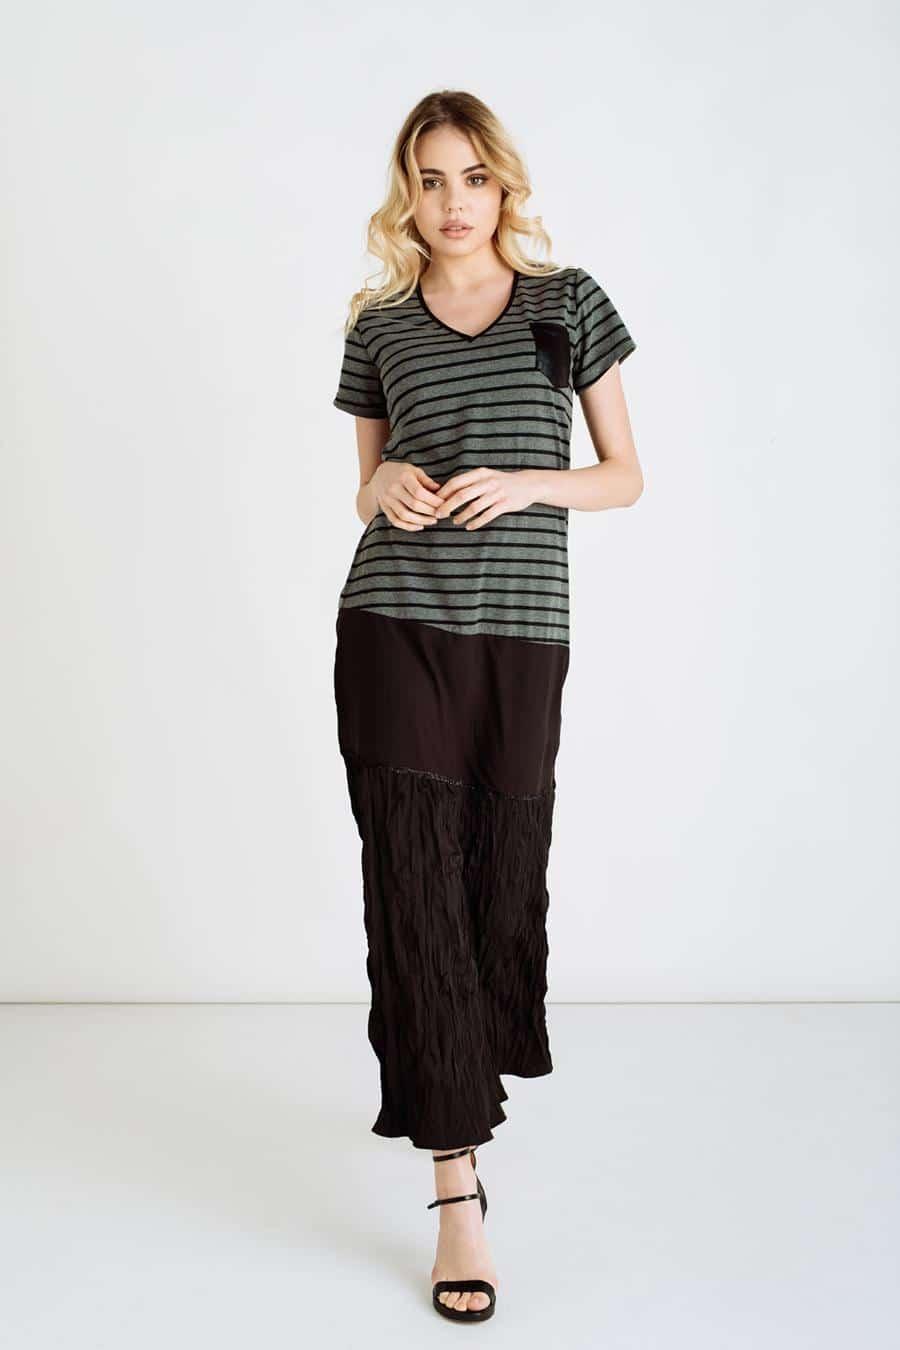 jagger zenska haljina kolekcija prolece leto ss2021 kupi online jg 5497 01 1